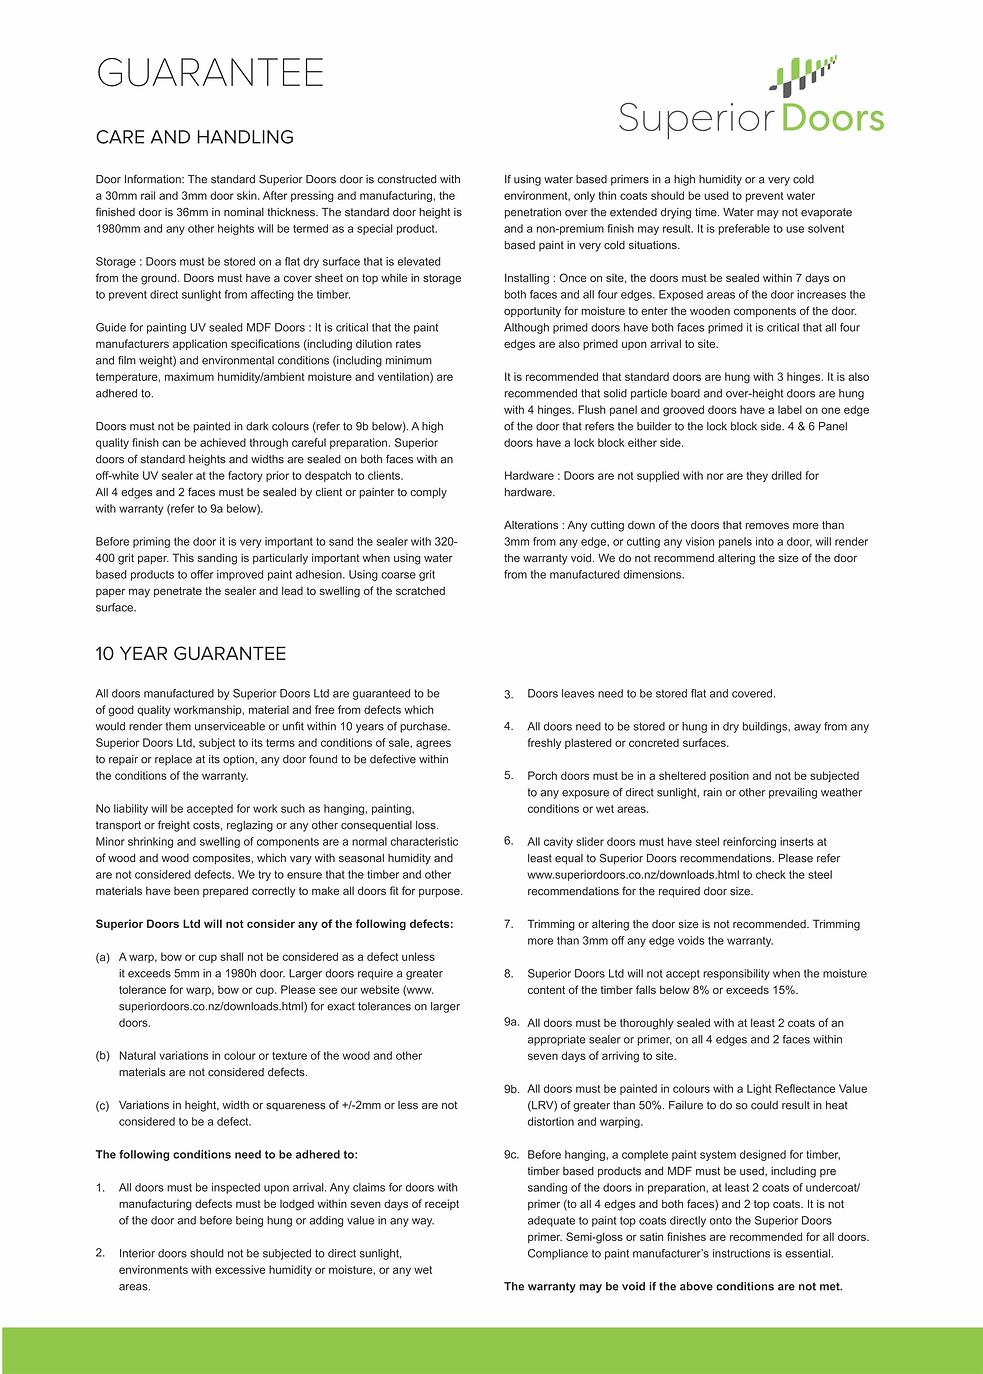 Superior Doors-Guarantee-Care-Handling-2